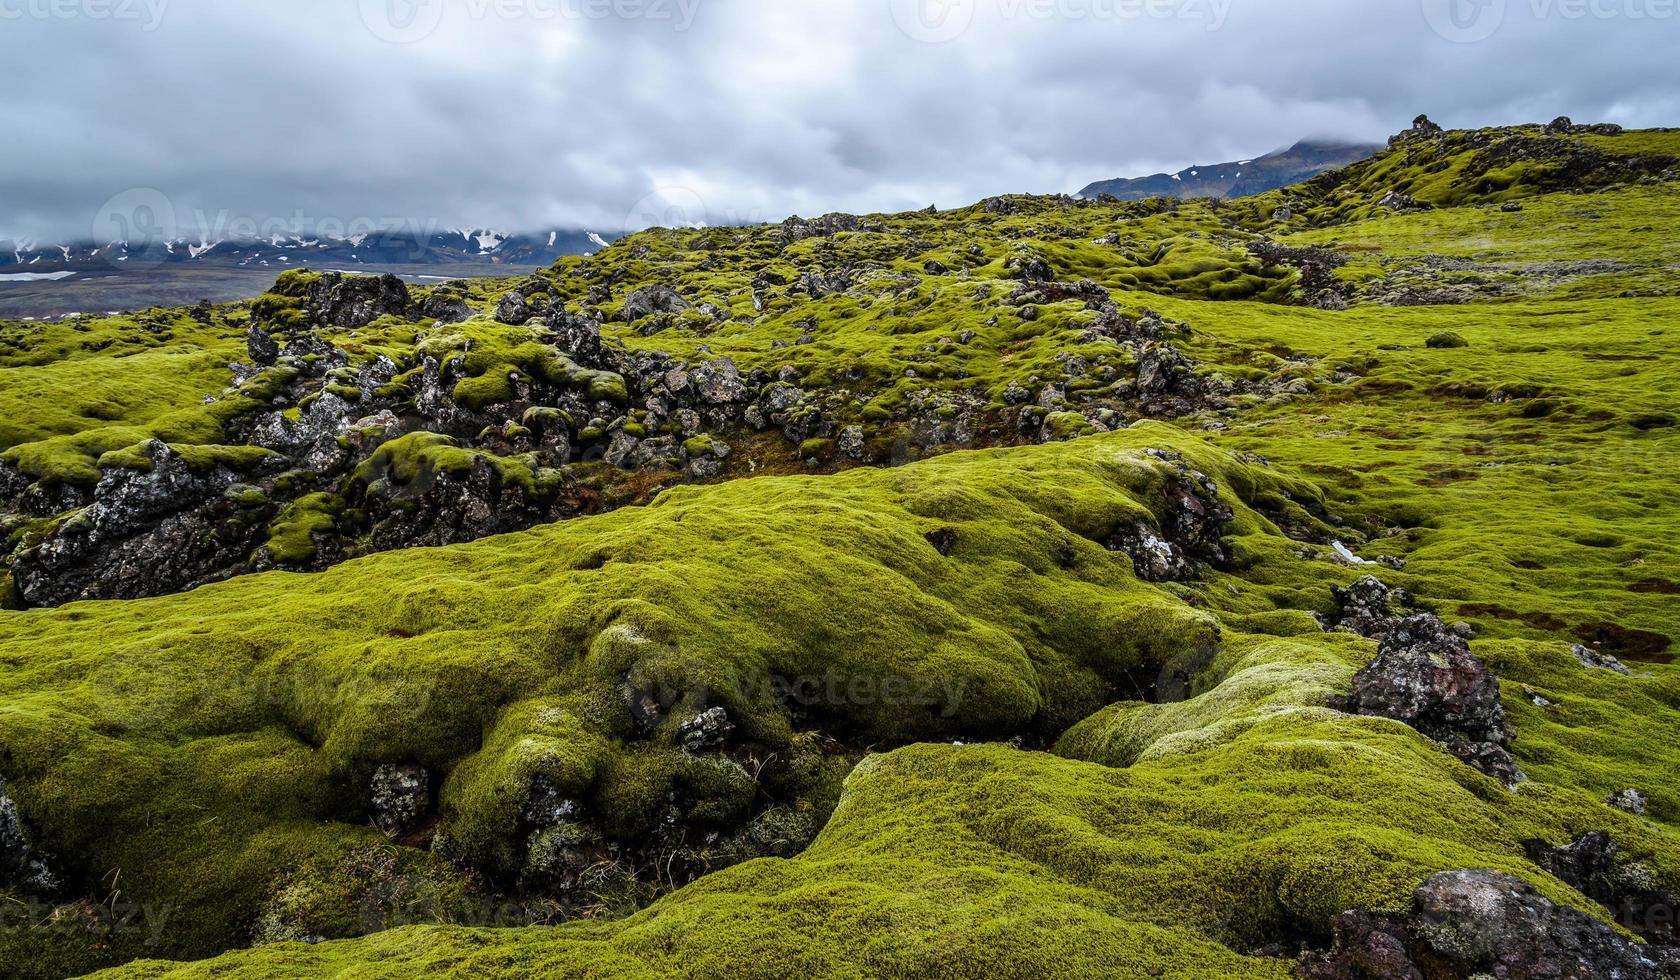 Lavafeld mit grünem Moos in Island foto